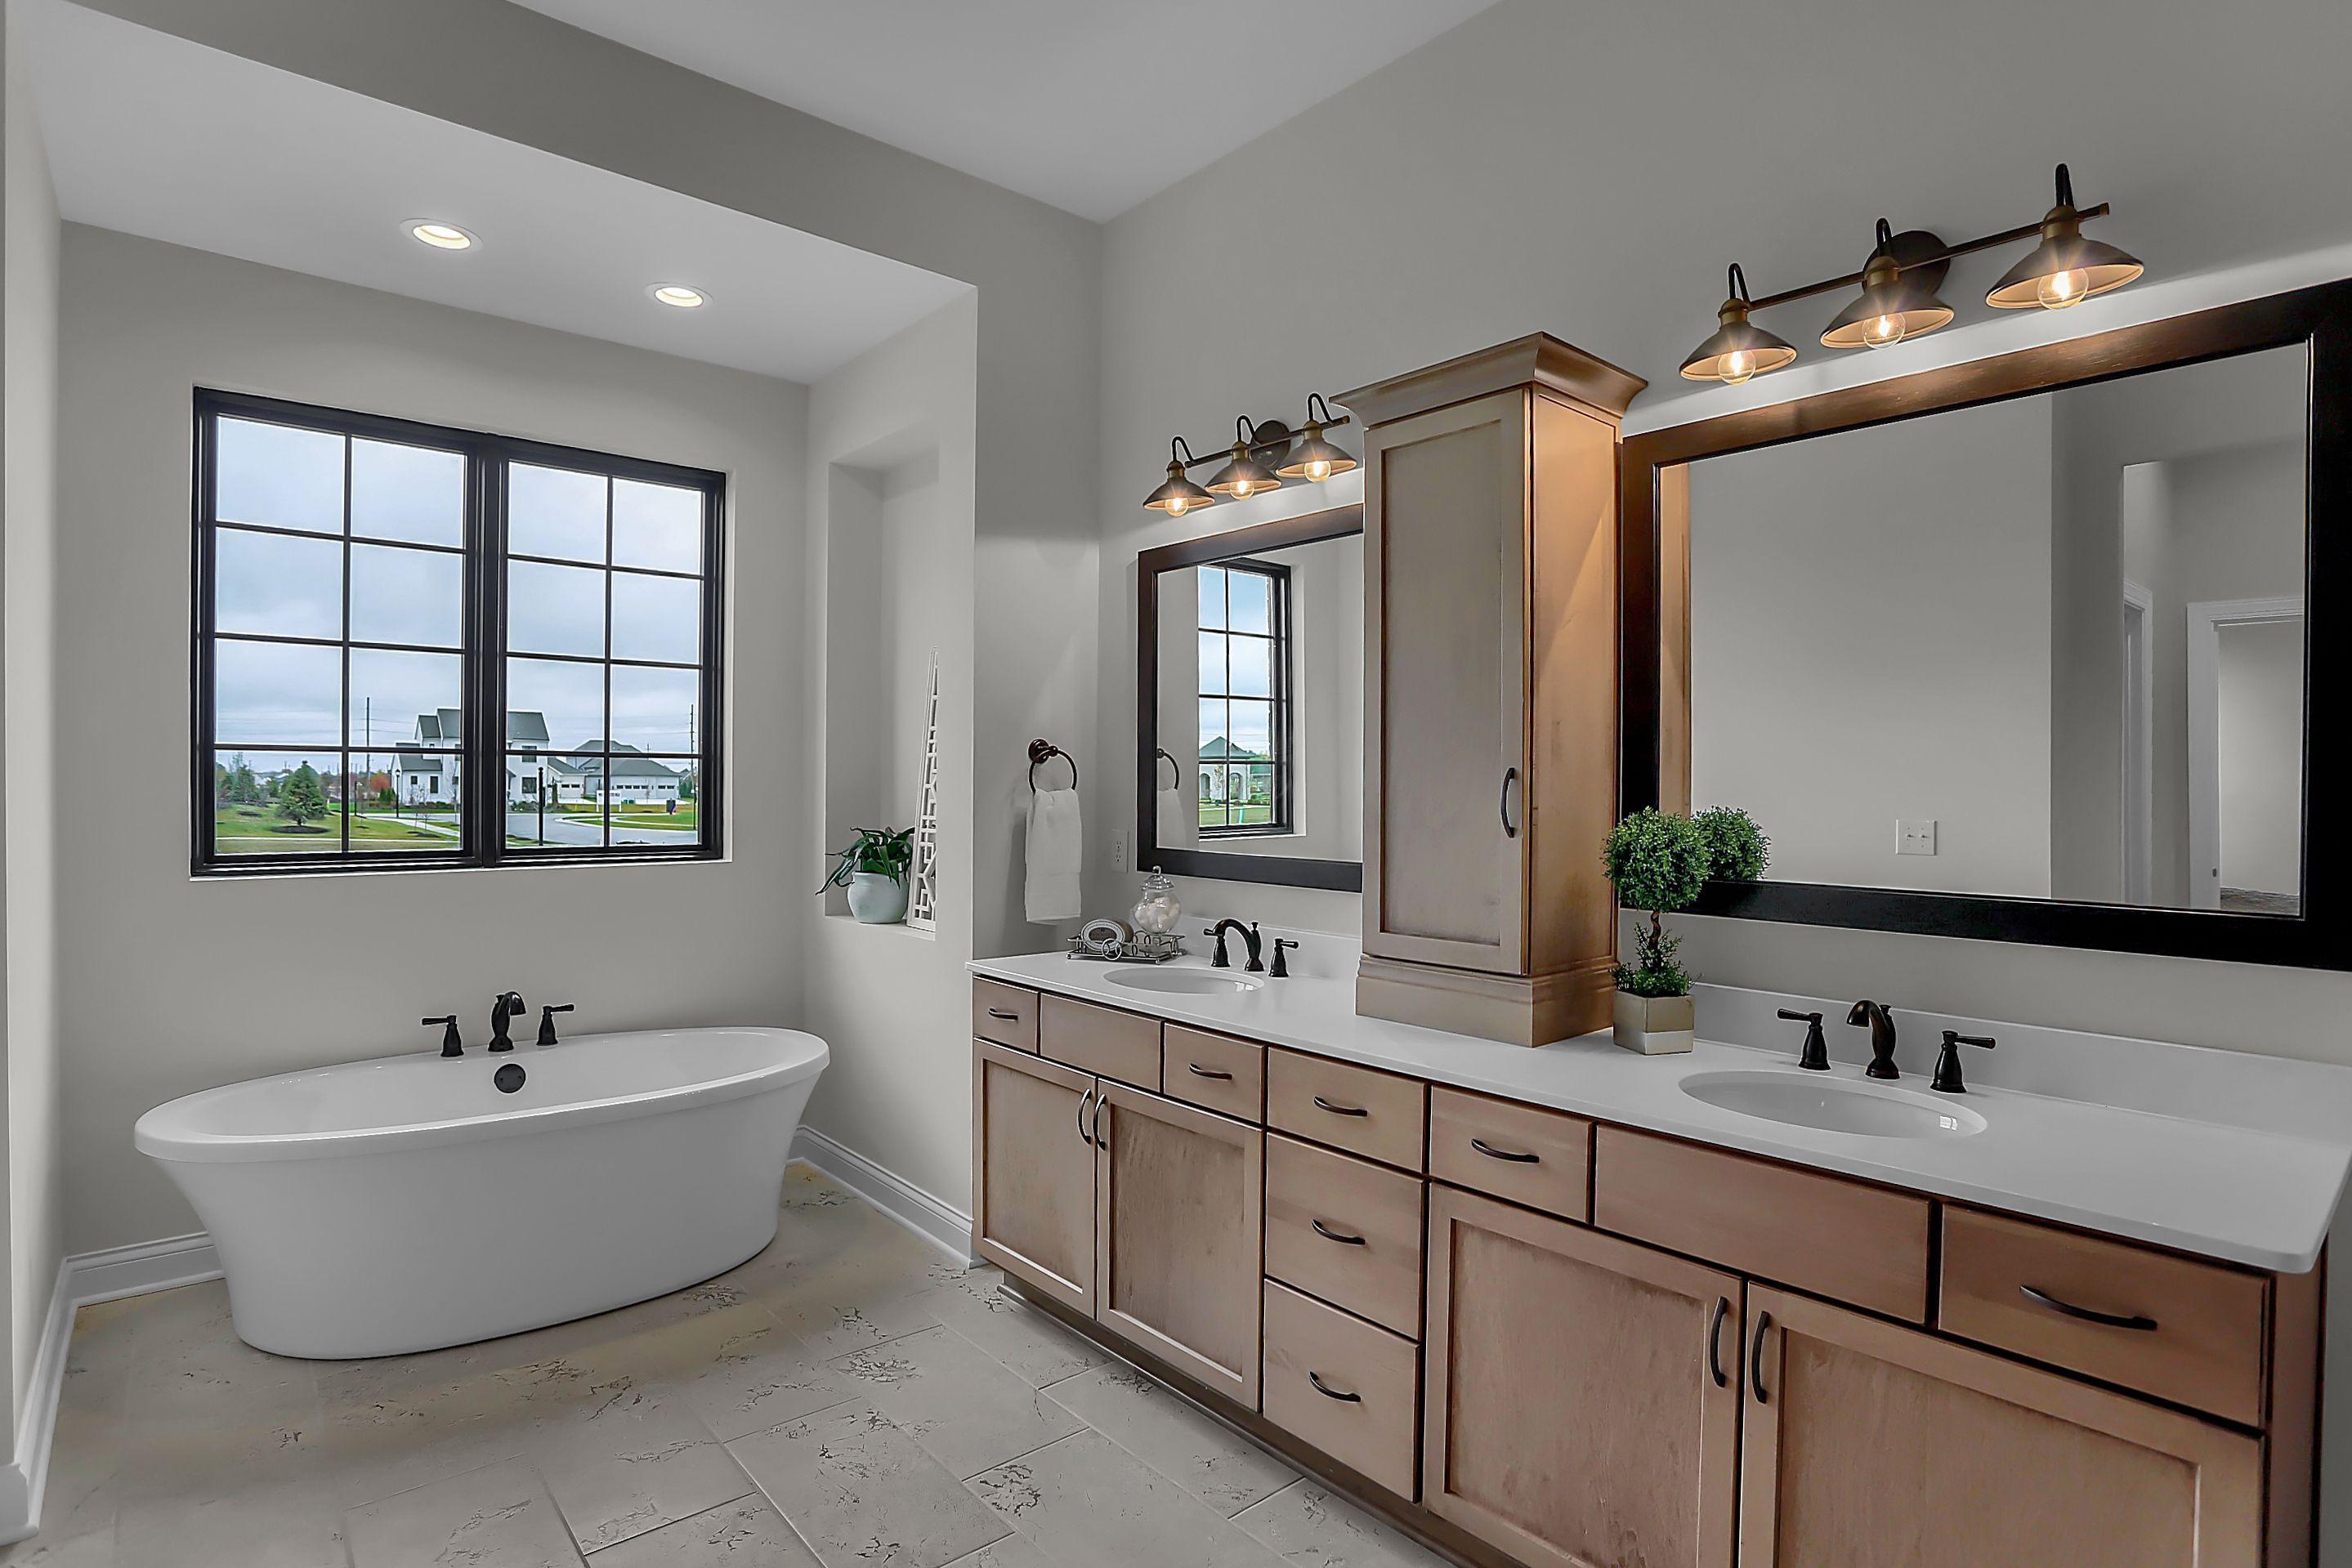 Bathroom featured in the Lockerbie 303 By Estridge Homes in Indianapolis, IN